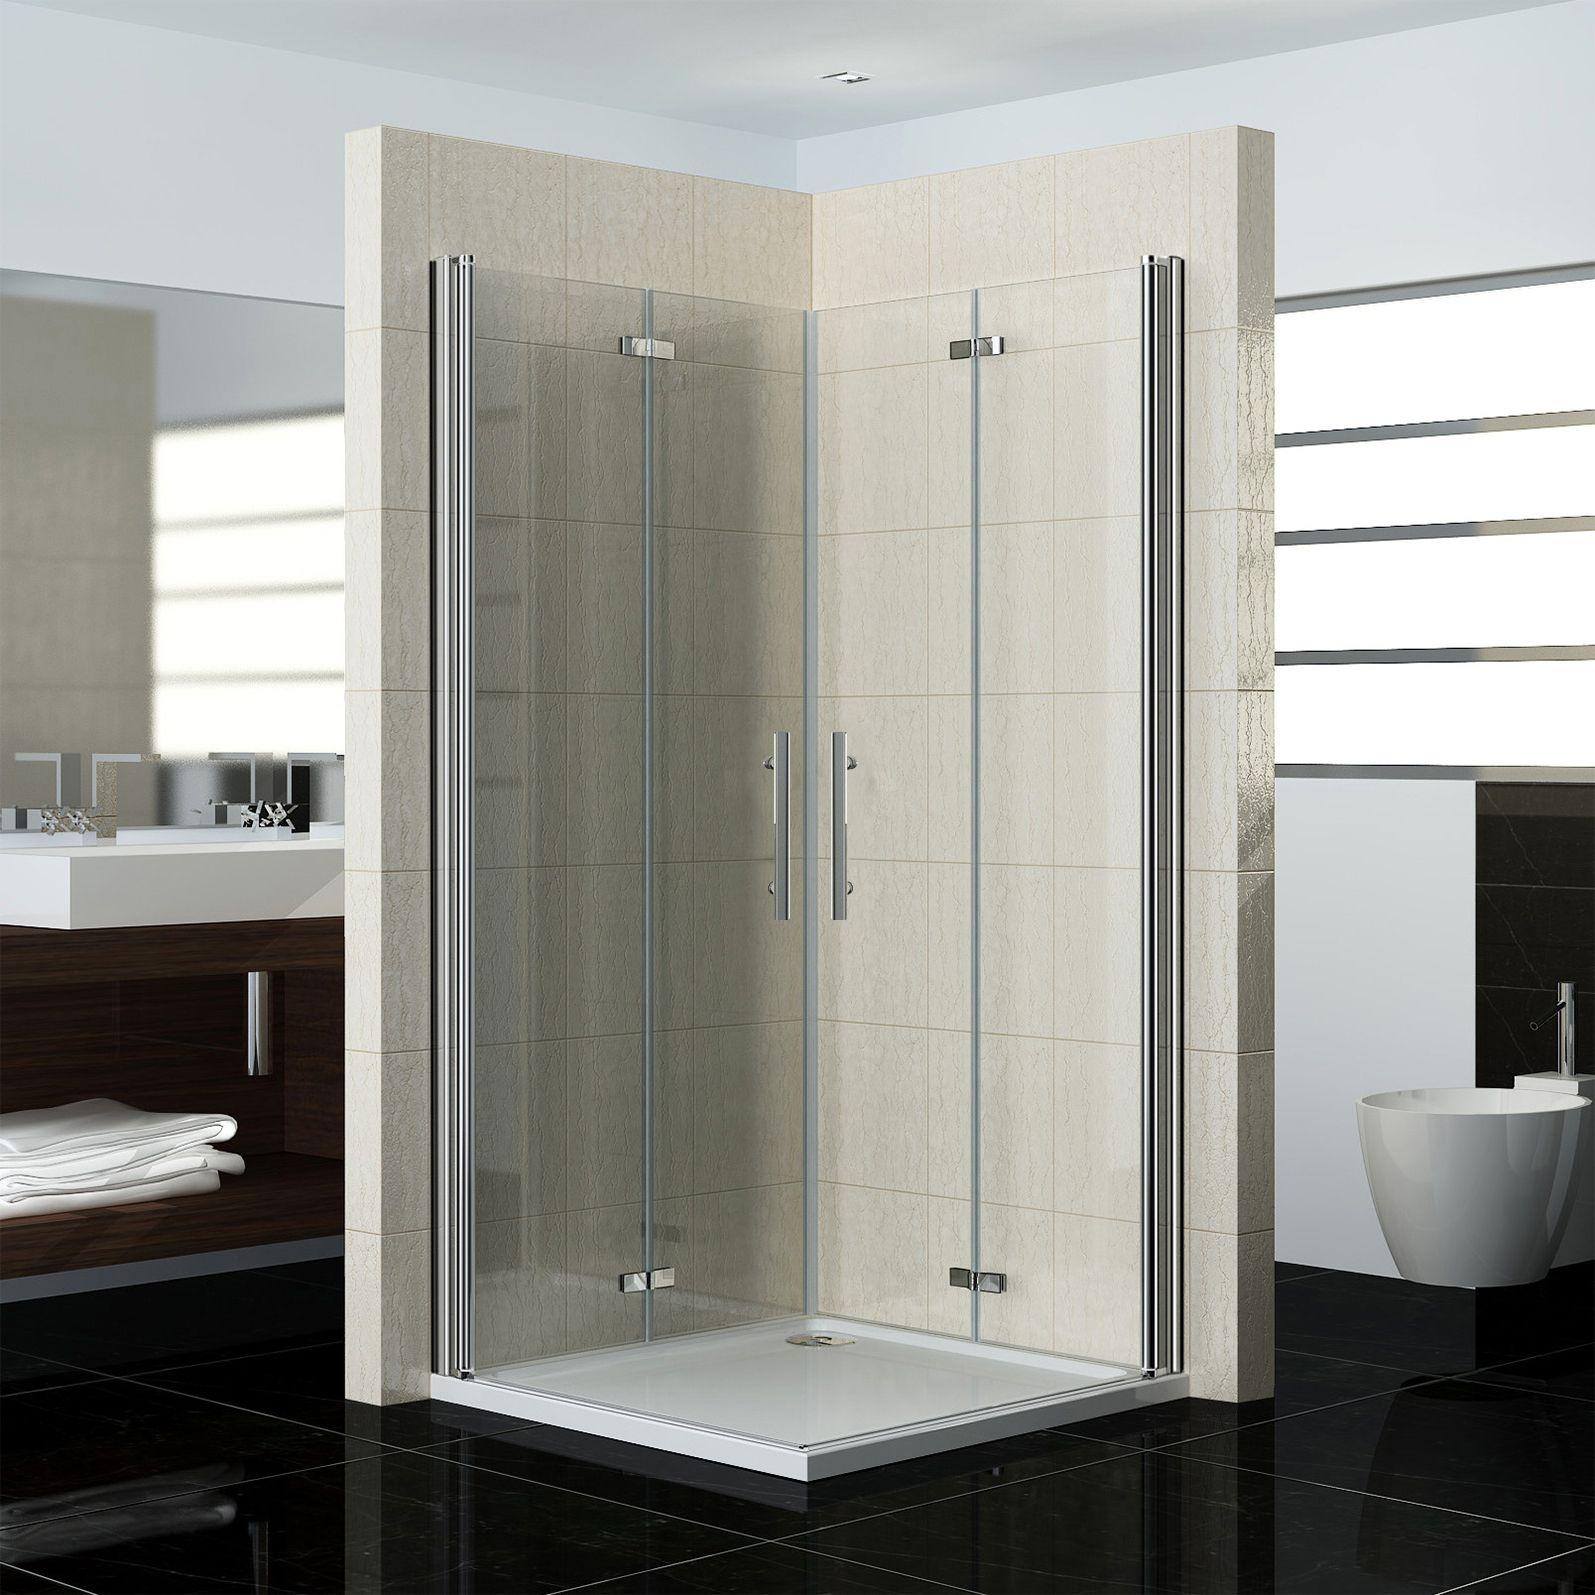 Duschabtrennung Duschkabine 180 Schwingtur Duschwand Dusche